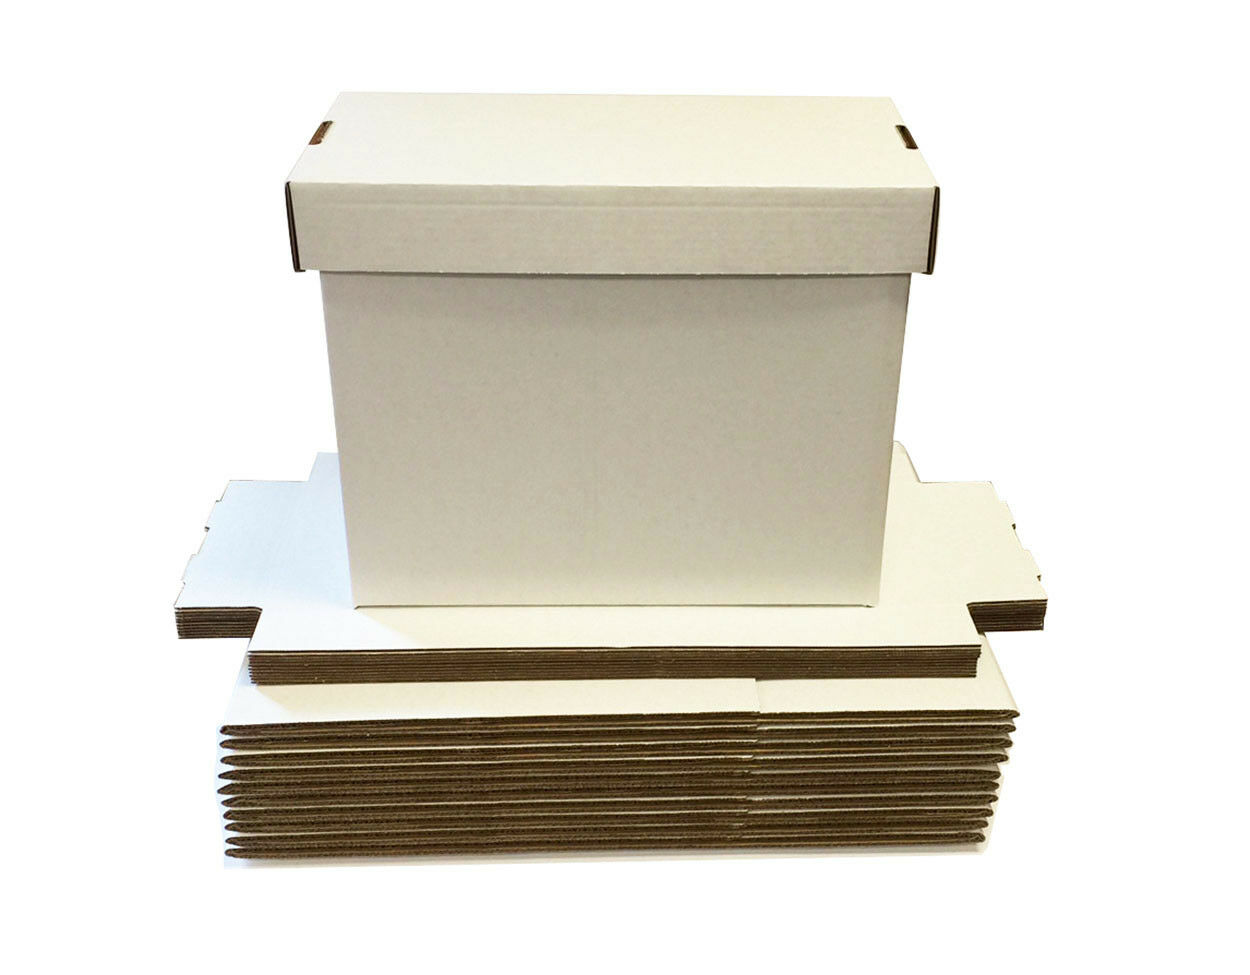 One New Max Pro Premium Long Comic Book Cardboard Storage Box